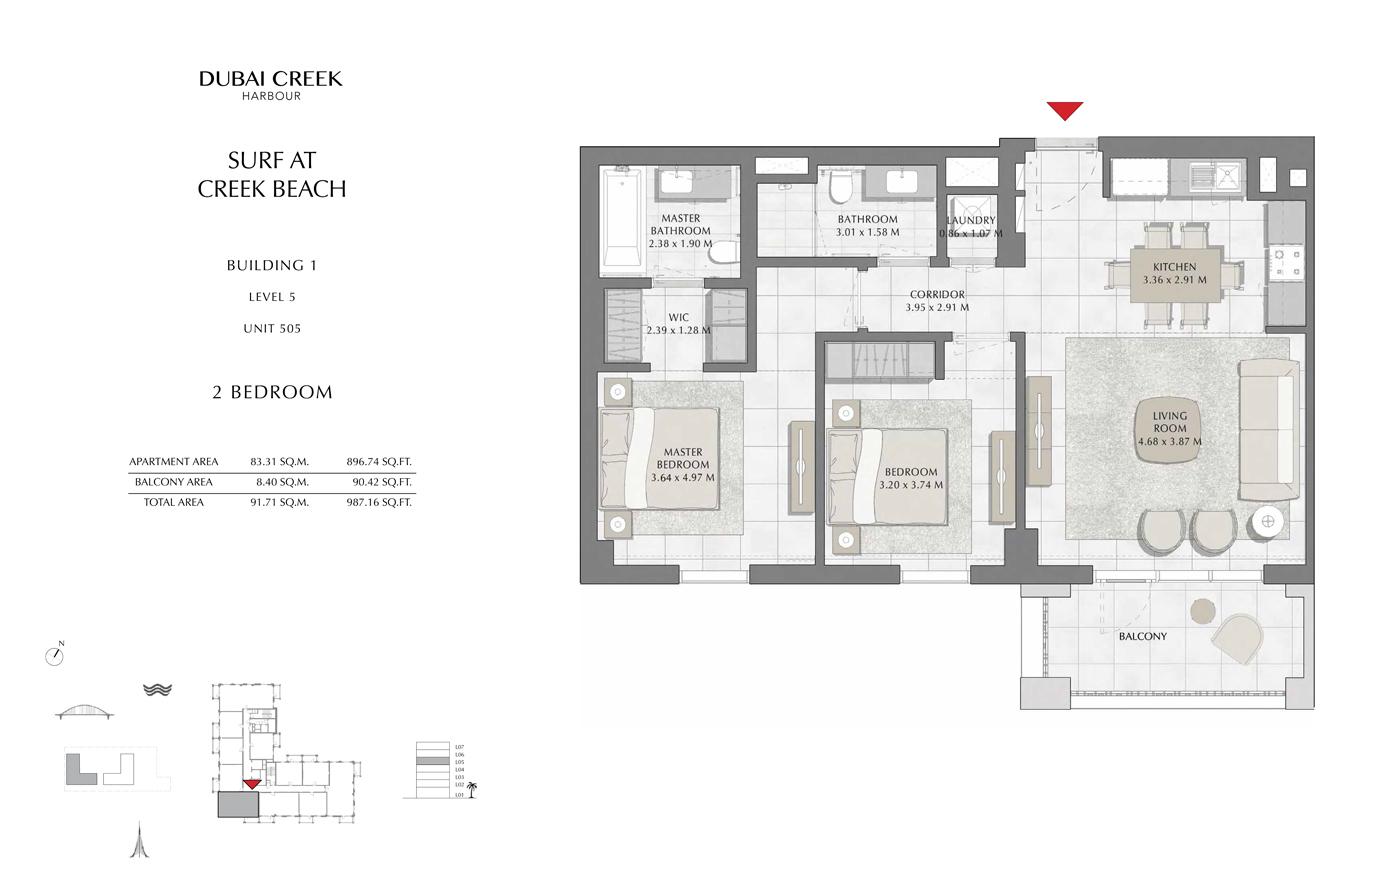 Building 1, 2 Bedroom, Level 5, Size 987 Sq Ft